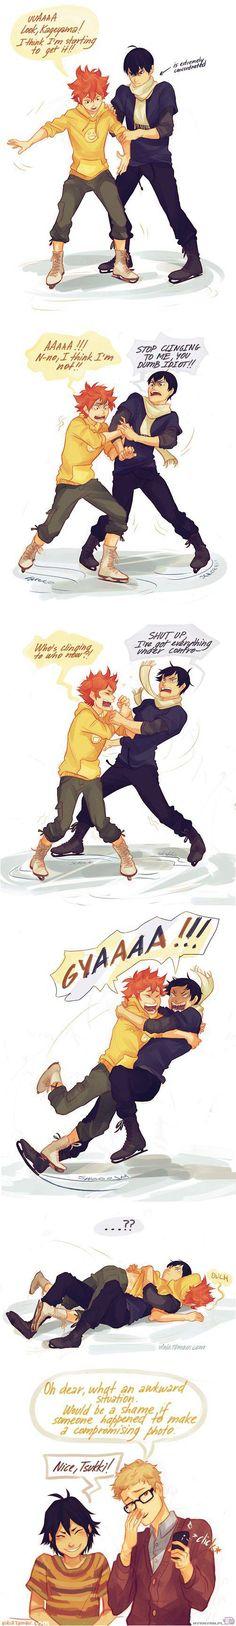 Haikyuu! Kageyama and Shoyo - ice skating :3